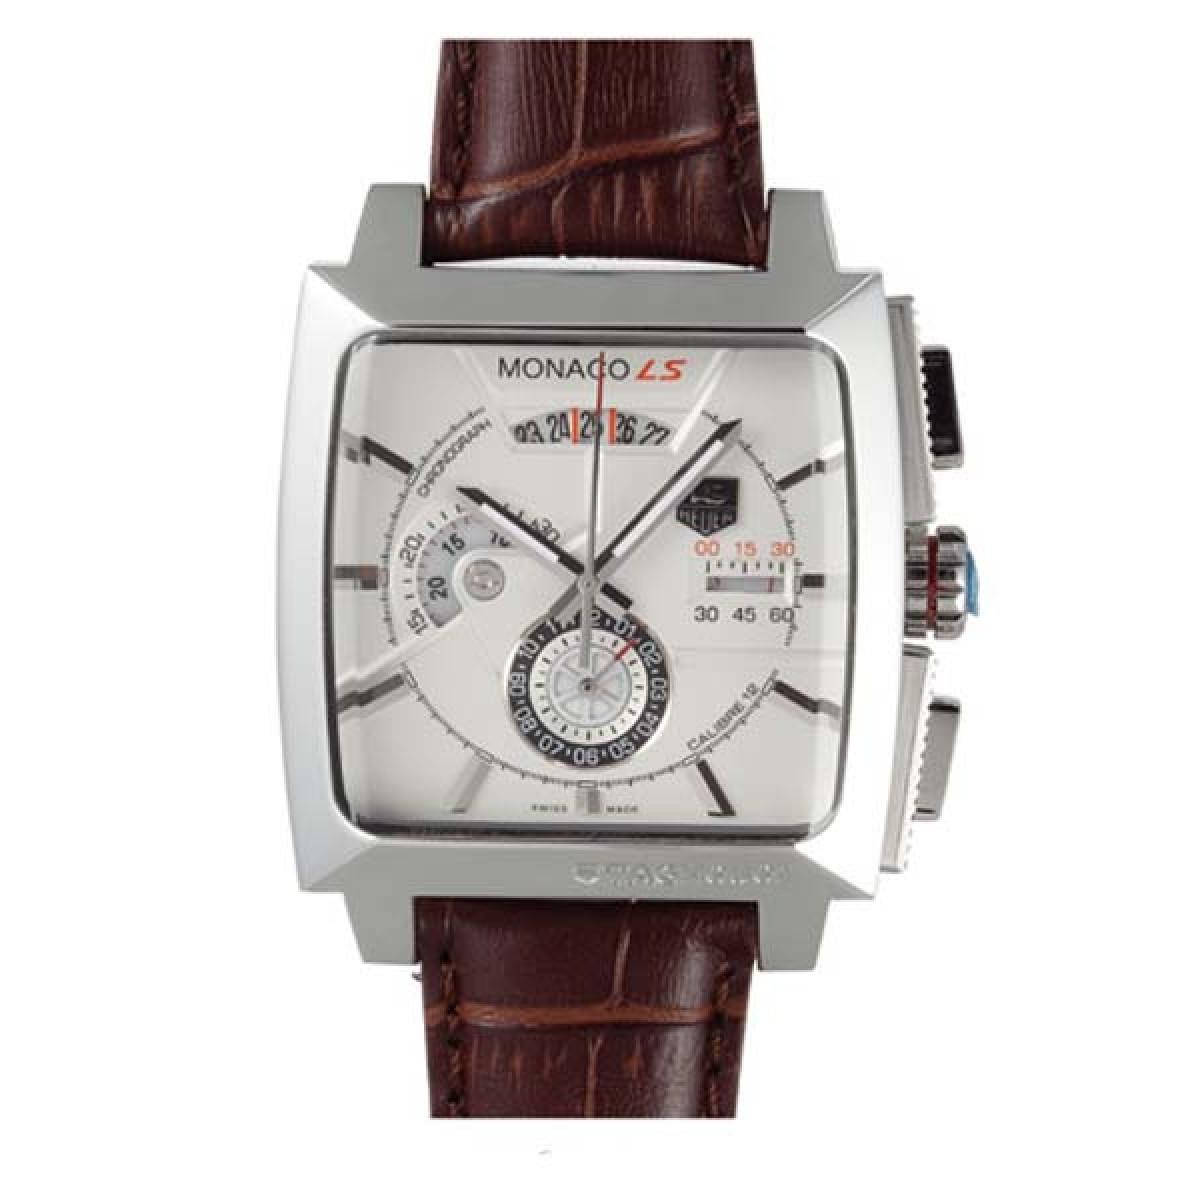 77b9ffdfa91 Relógio Réplica Tag Heuer Monaco ls Branco